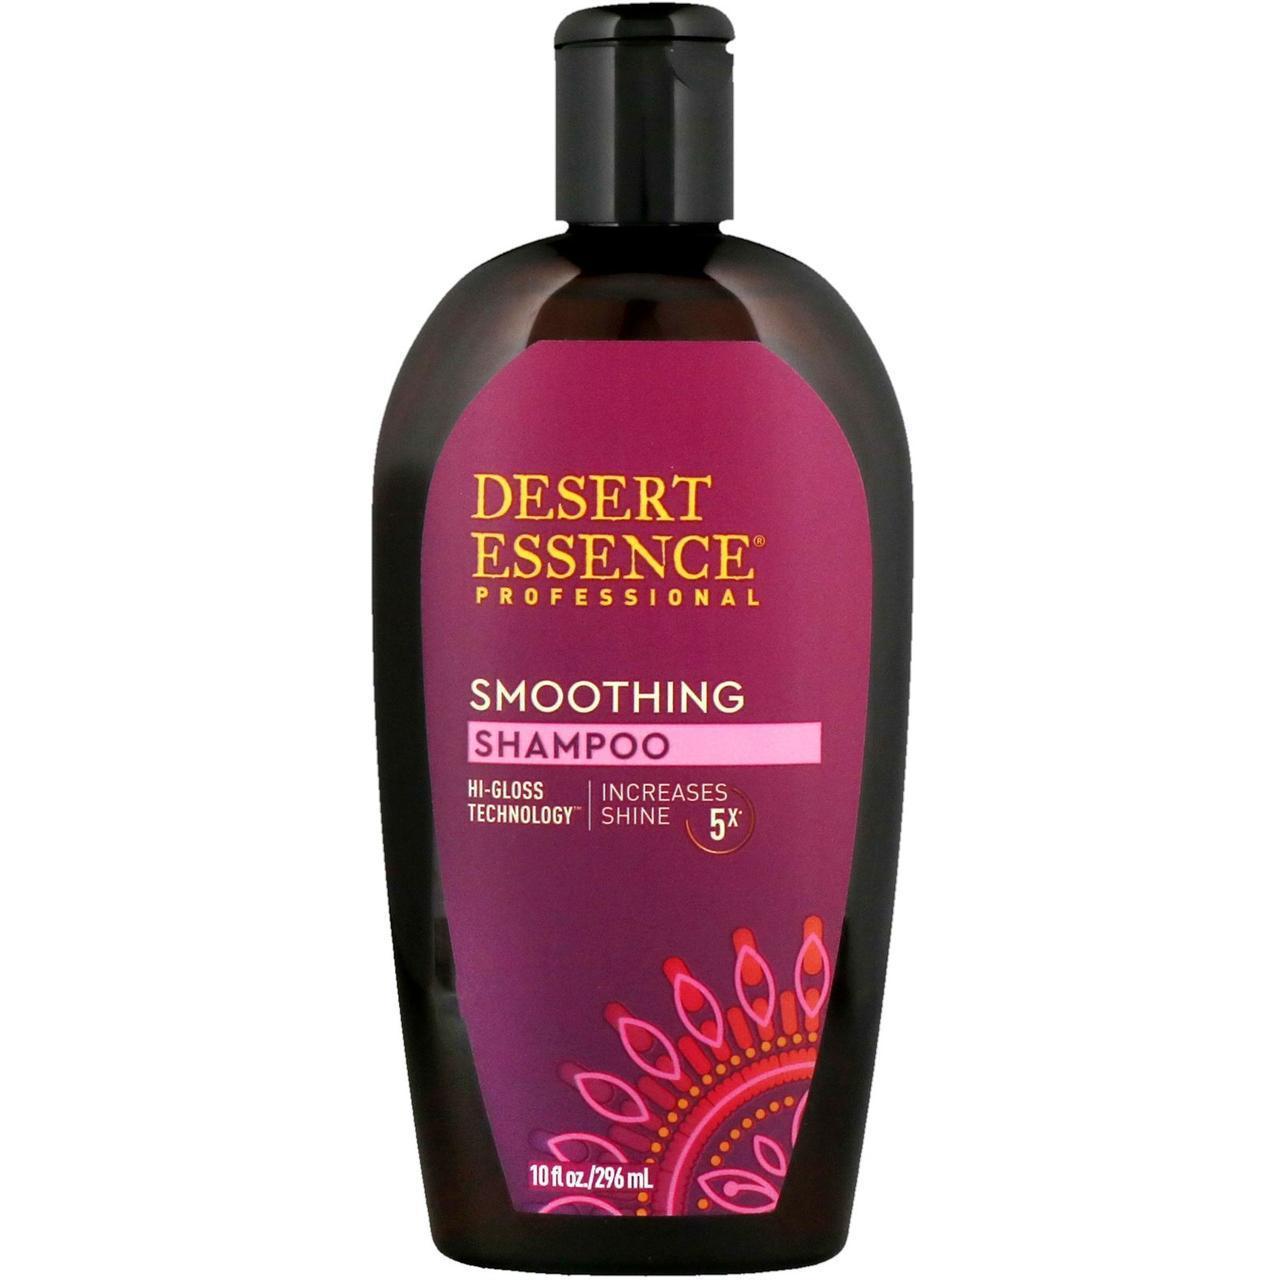 Розгладжуючий шампунь (296 ml) Desert Essence